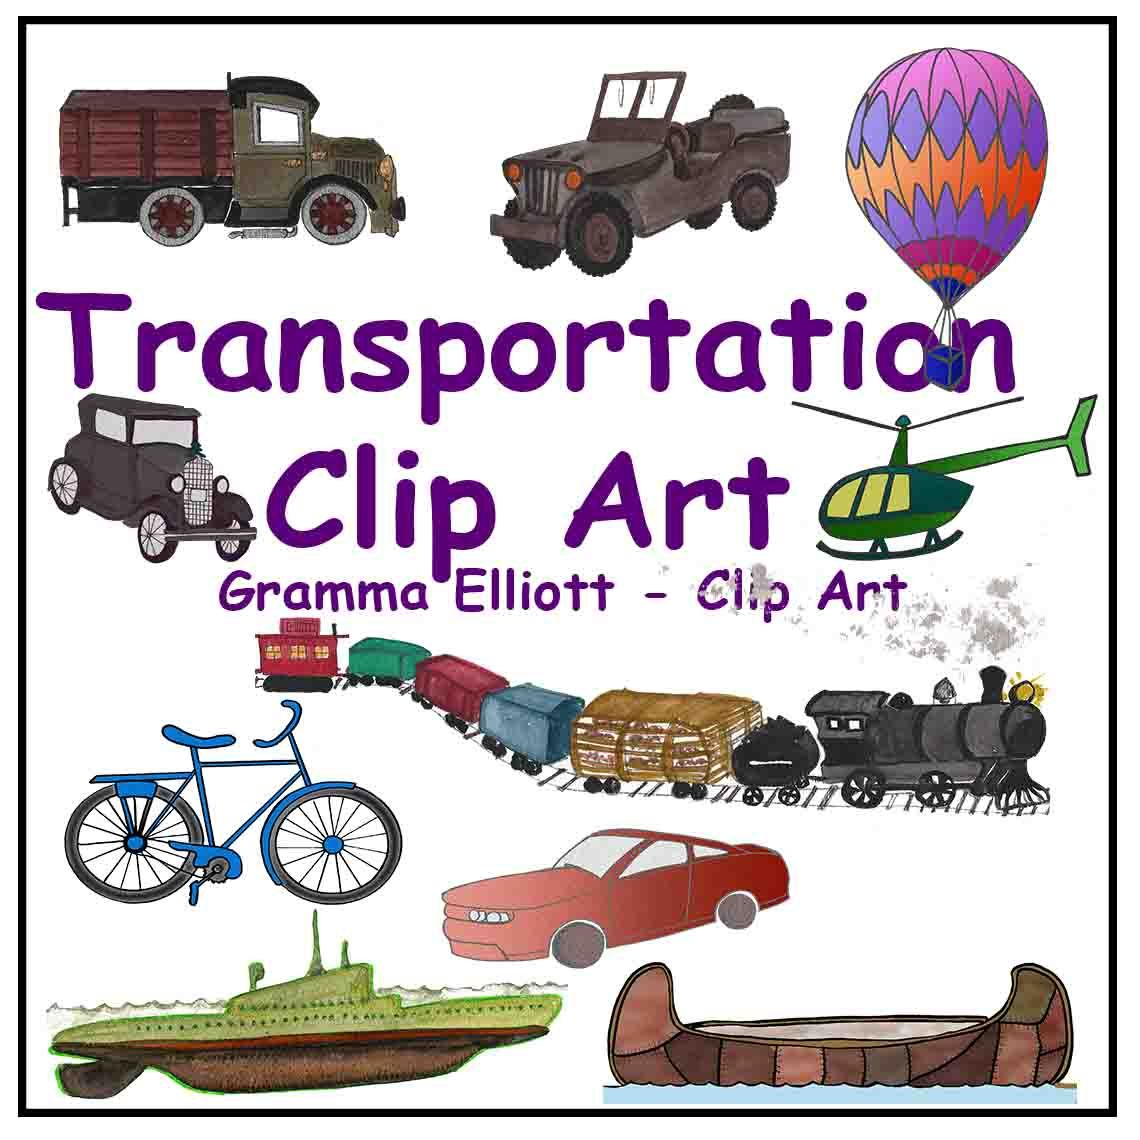 Clip art train boat. Bike clipart transportation